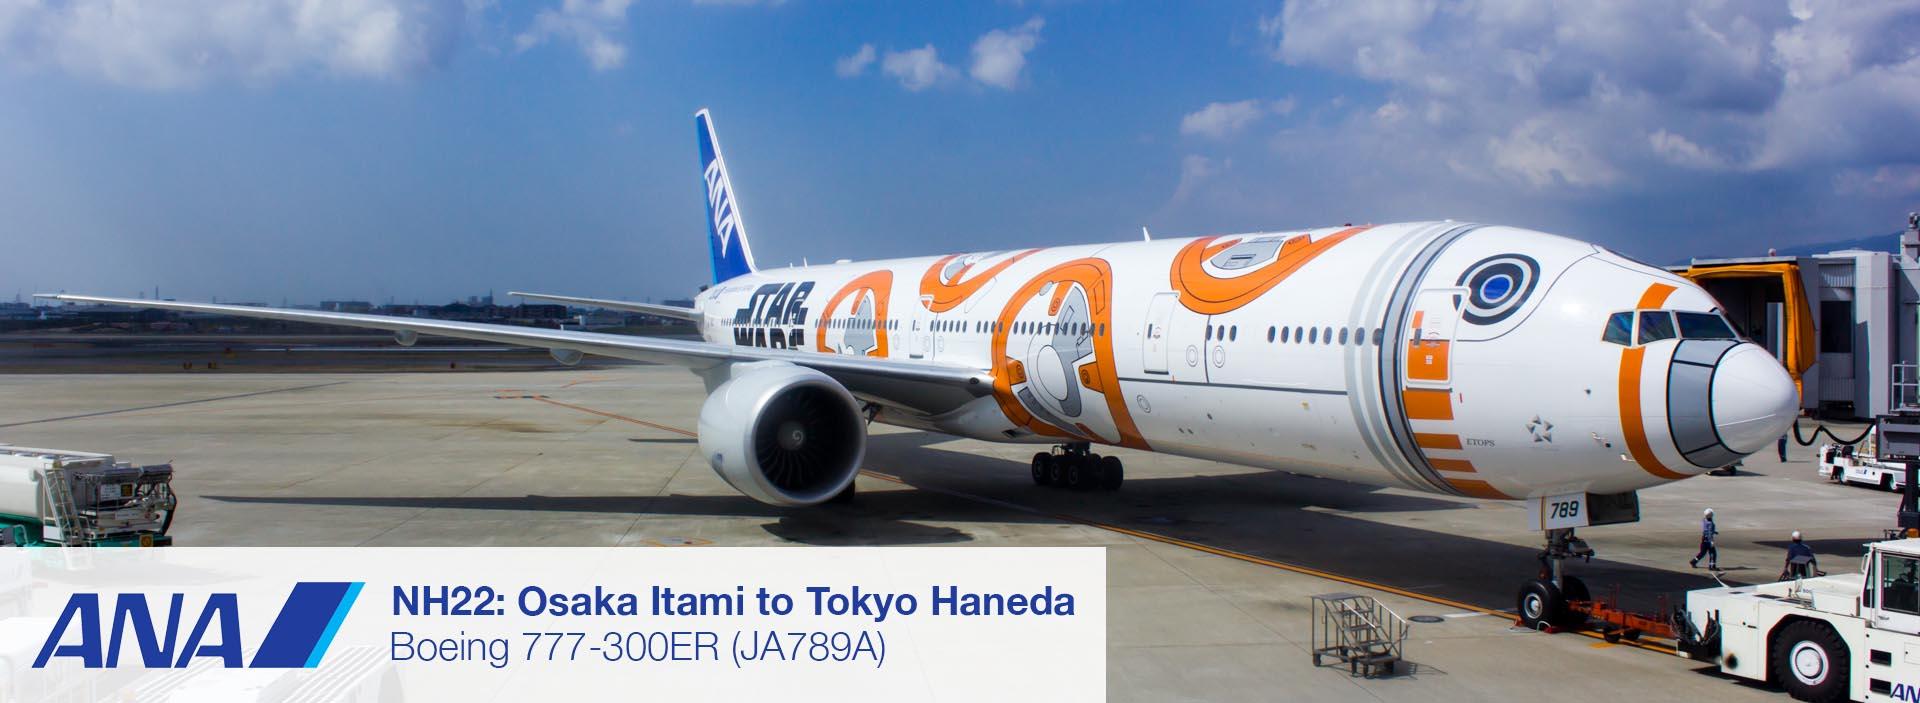 ANA 777-300ER Star Wars BB-8 Flight Review